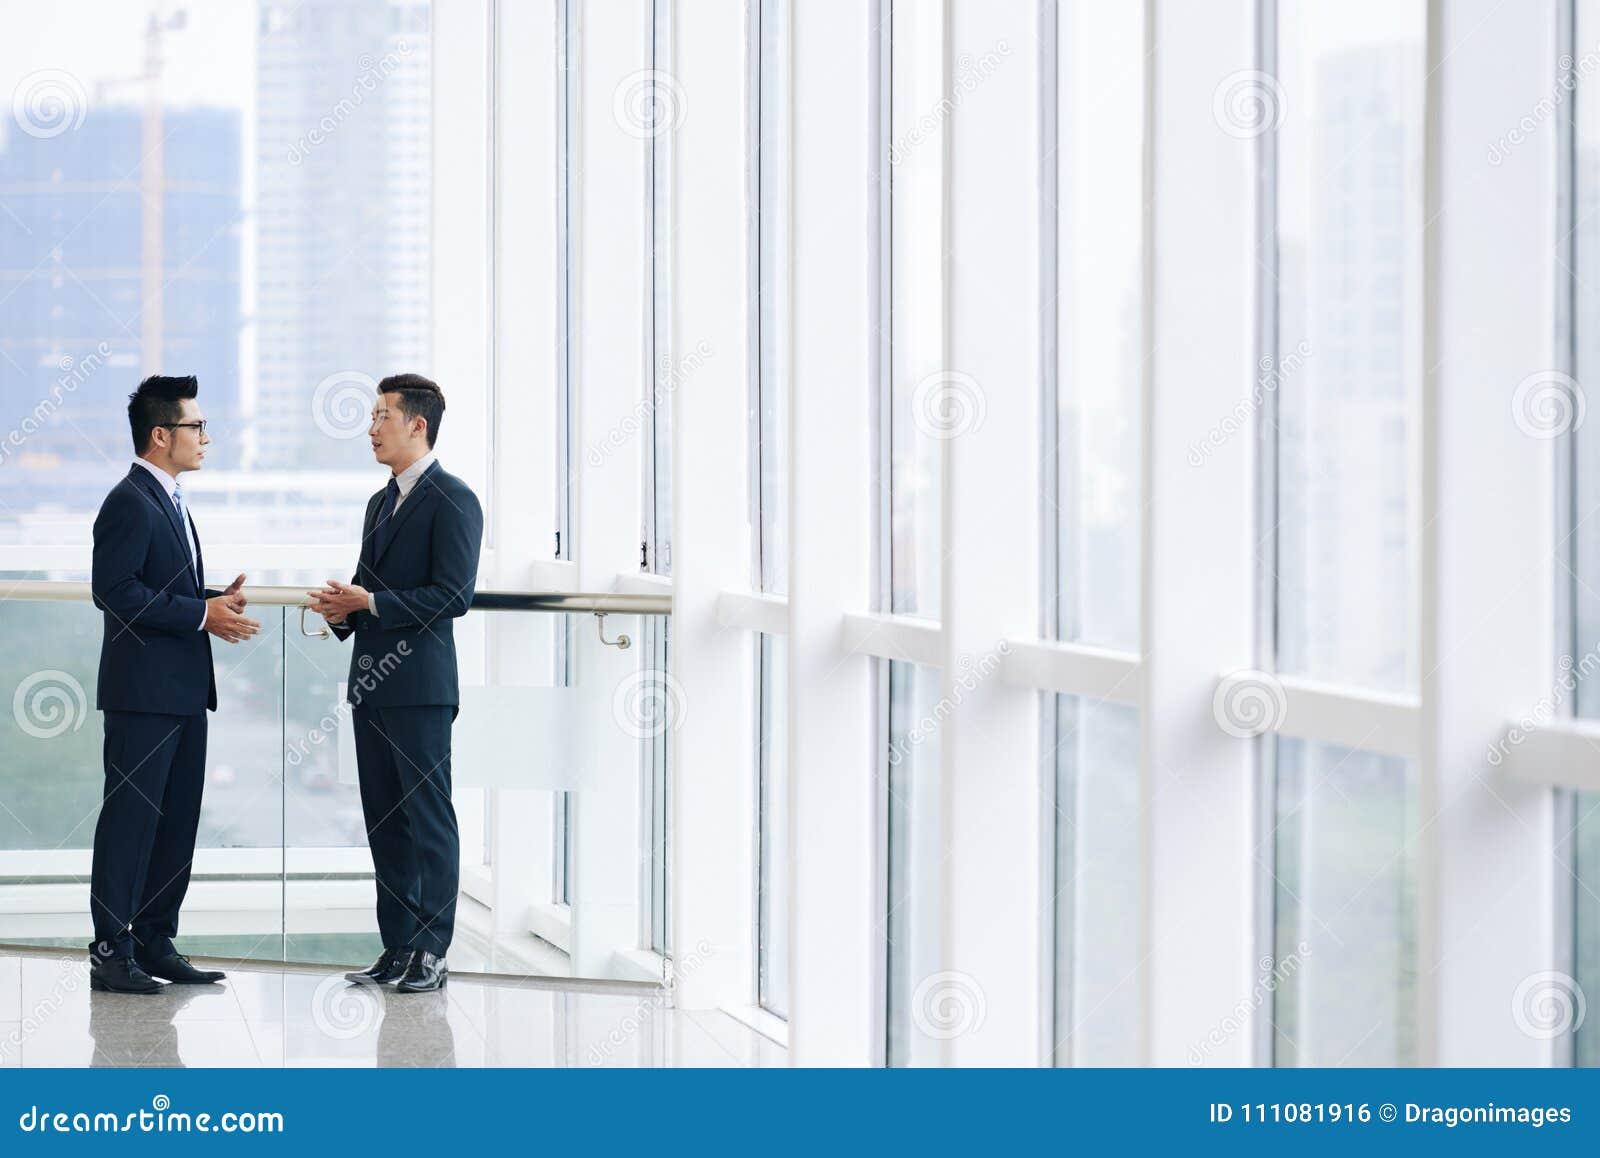 Talking business executives